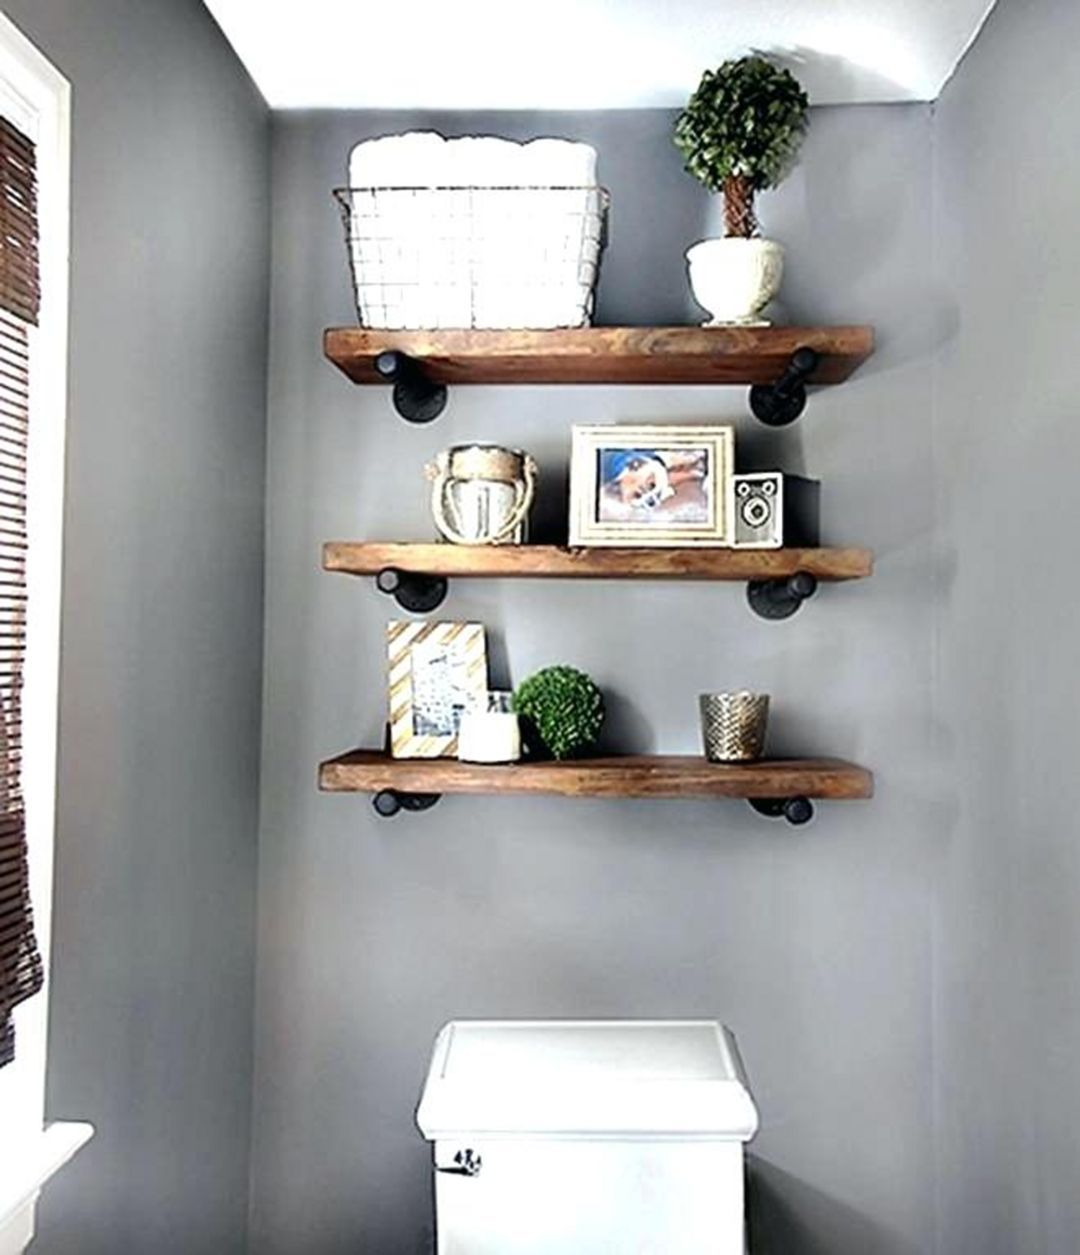 15 Interesting Floating Wall Shelves For Your Bathroom Style Ideas Design Decorating Diy Shelves Bathroom Diy Wall Shelves Shelves